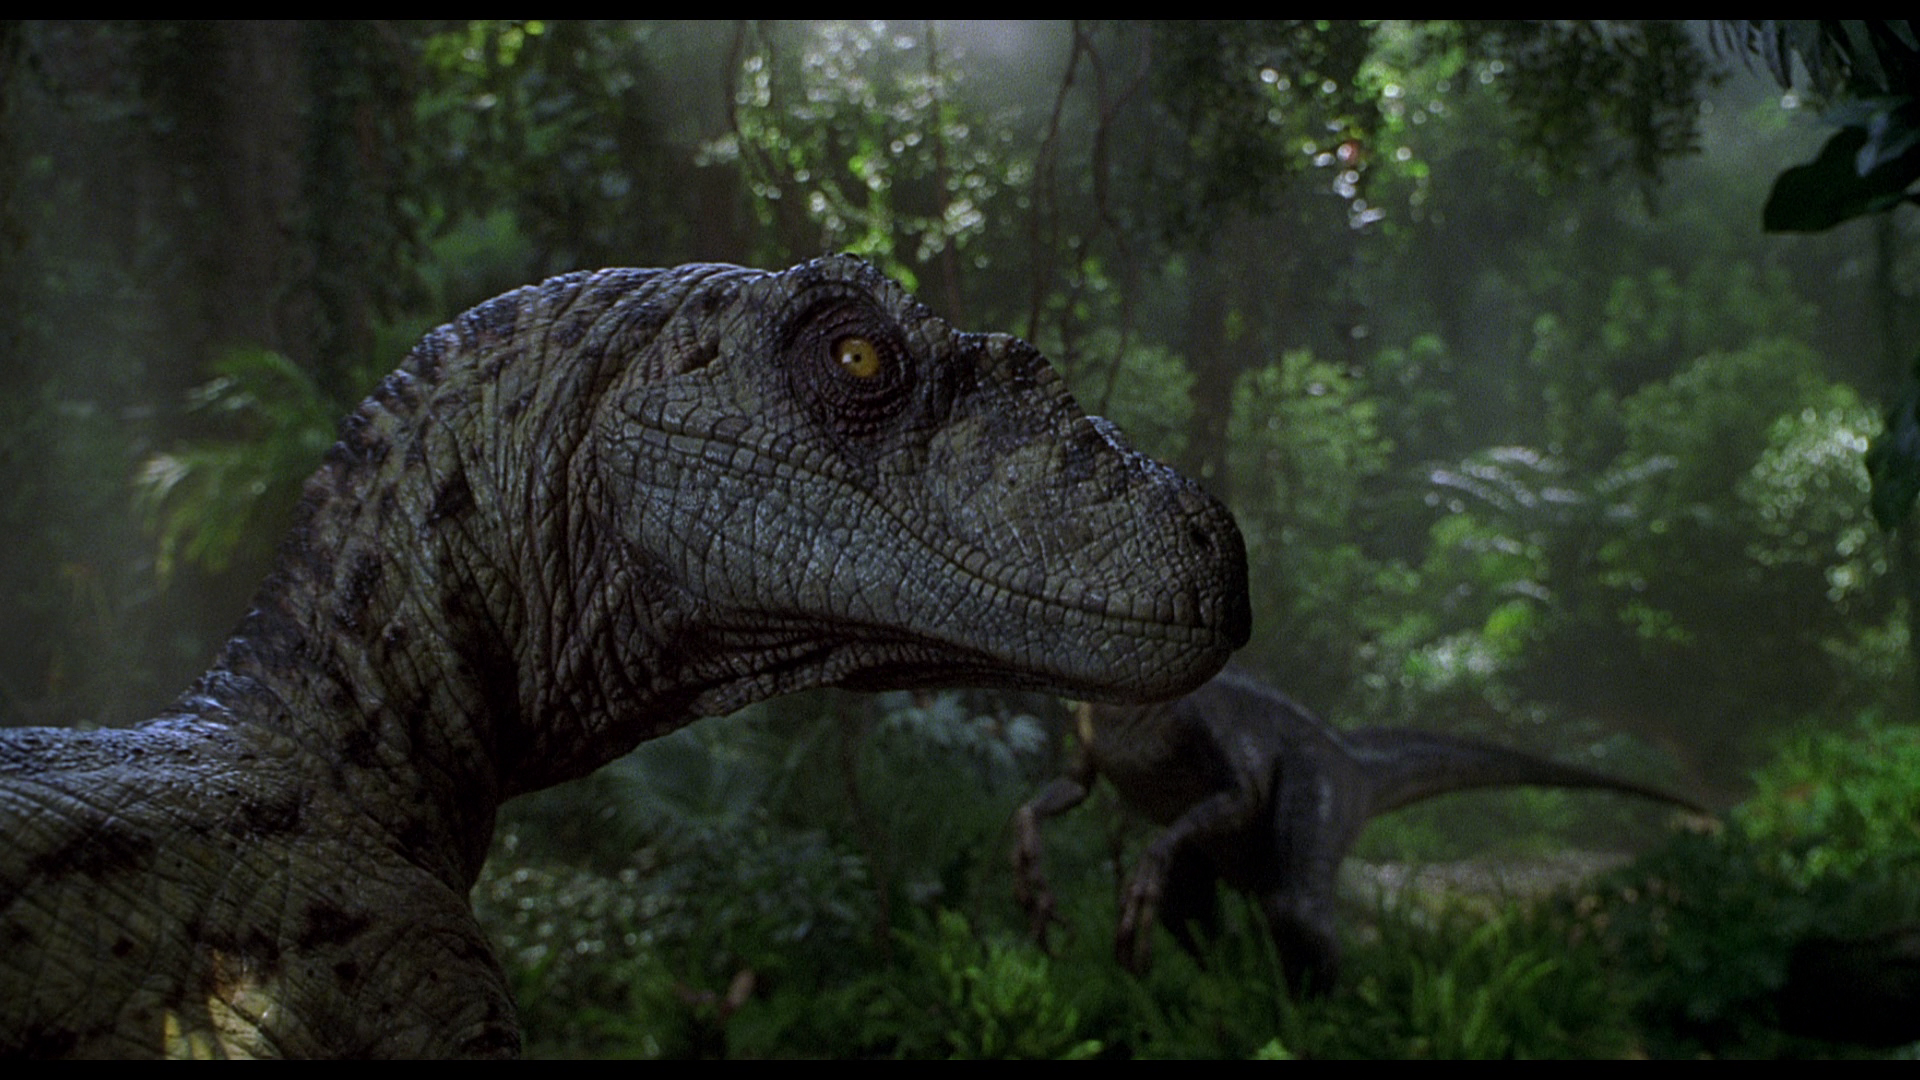 Jurassic Park Wallpapers Wallpaper